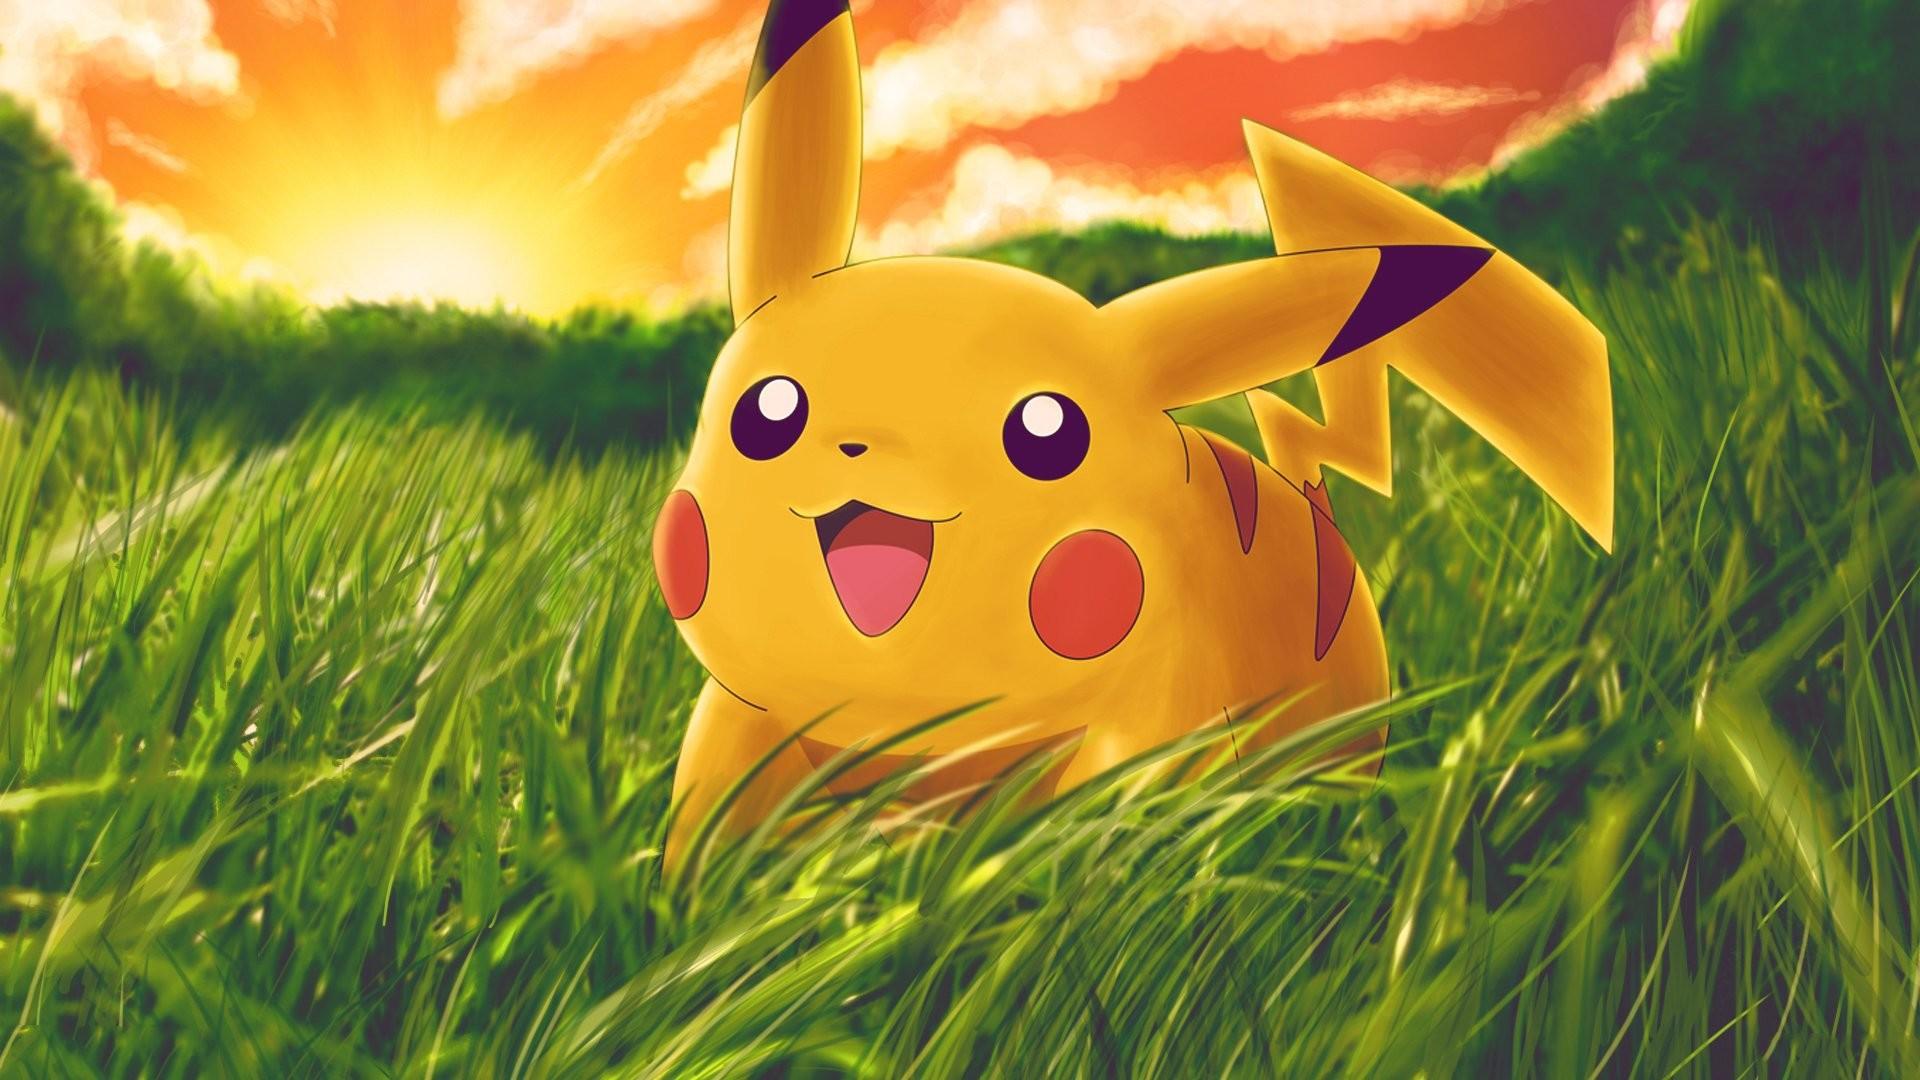 HD Wallpaper   Hintergrund ID:641968. Anime Pokémon